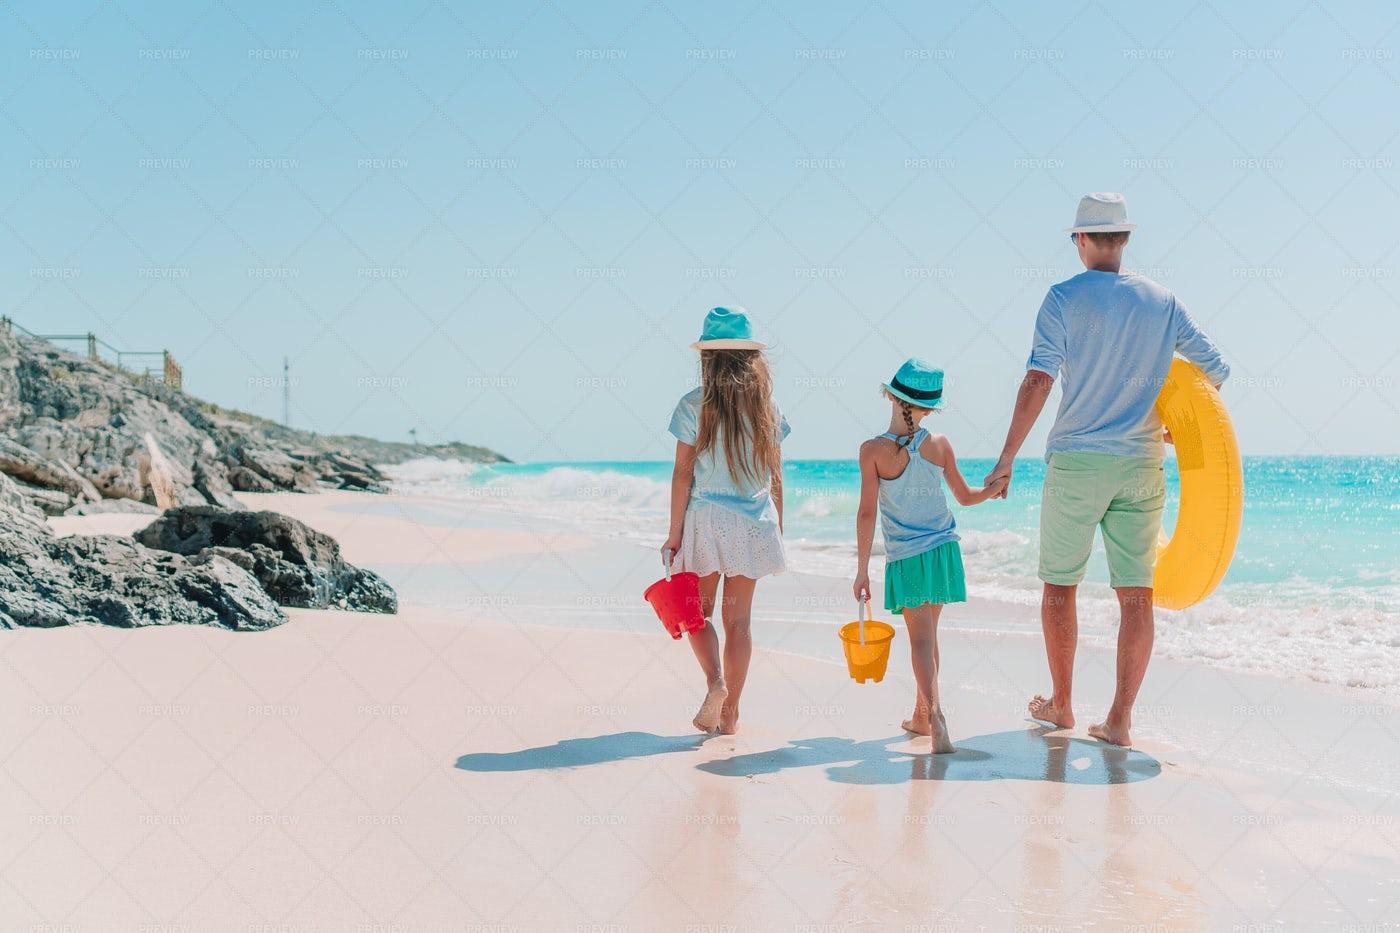 Family Caribbean Beach Vacation: Stock Photos